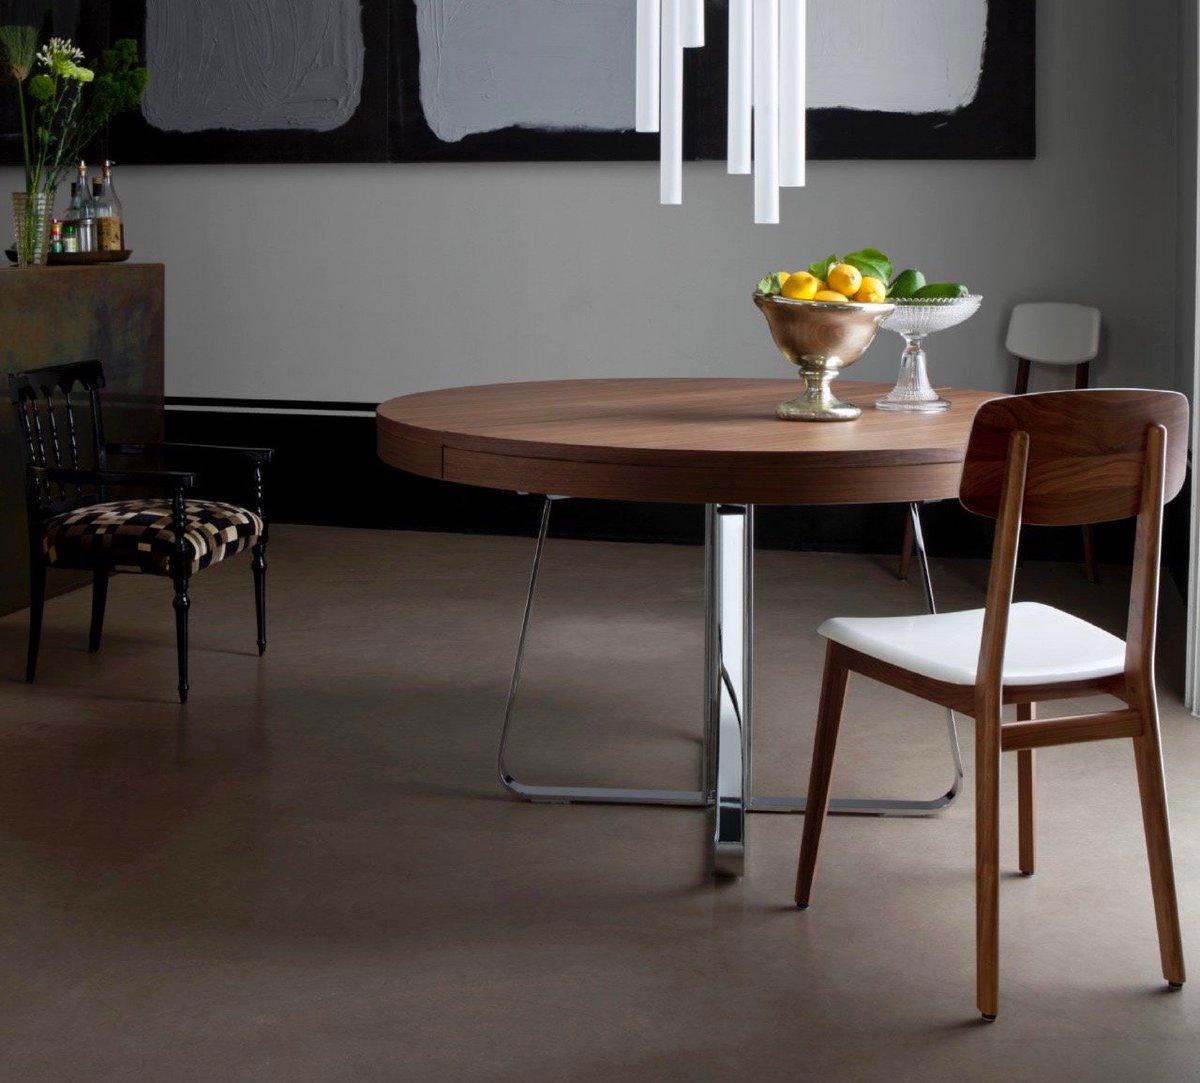 cinna cinnatm twitter. Black Bedroom Furniture Sets. Home Design Ideas